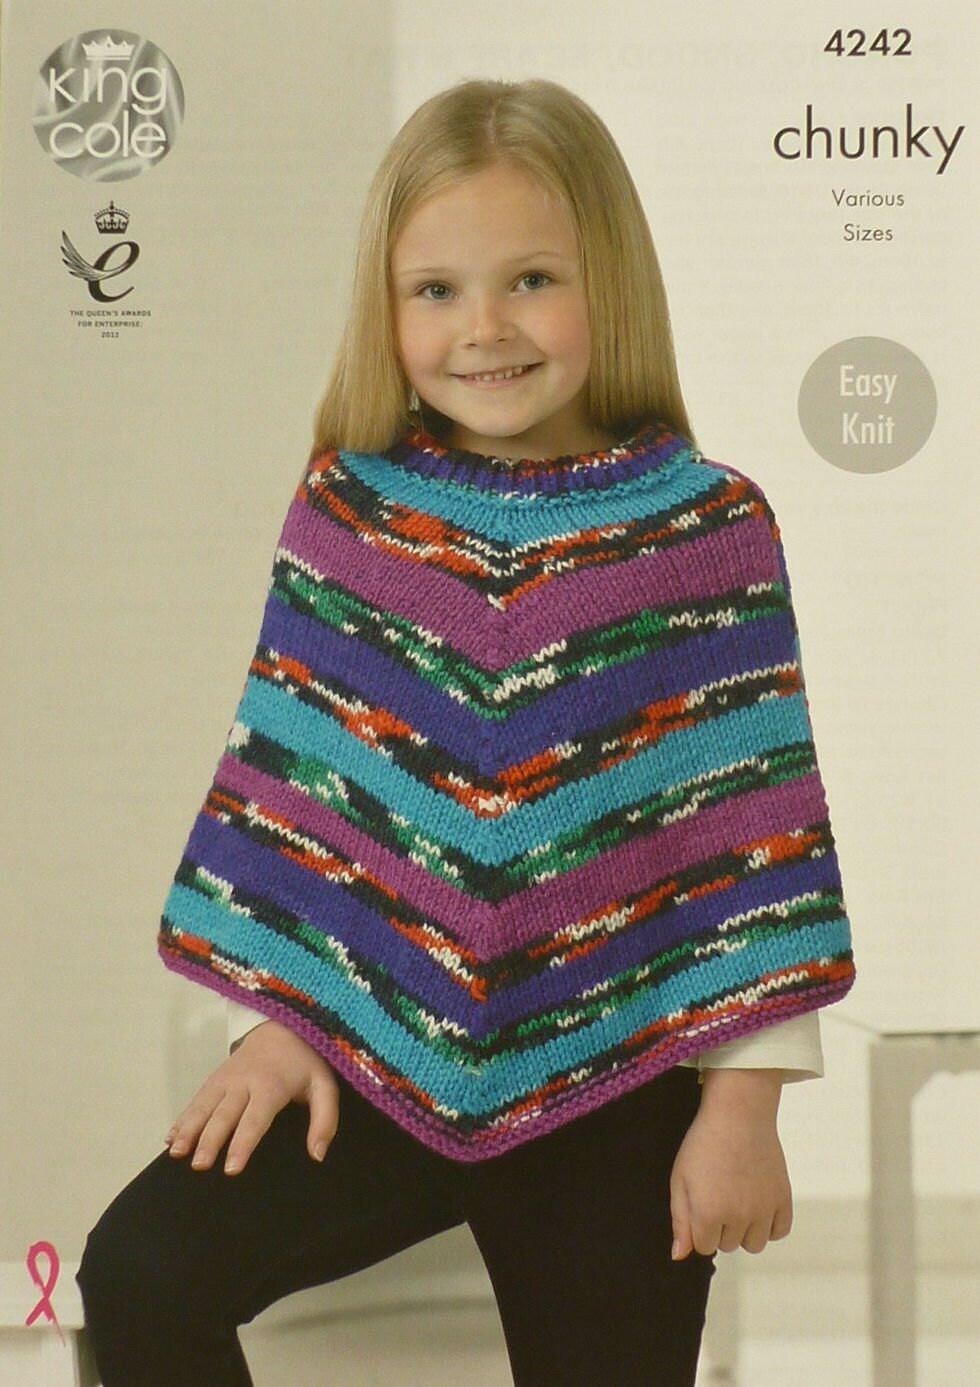 Girls knitting pattern k4242 childrens easy knit poncho knitting 464 bankloansurffo Choice Image